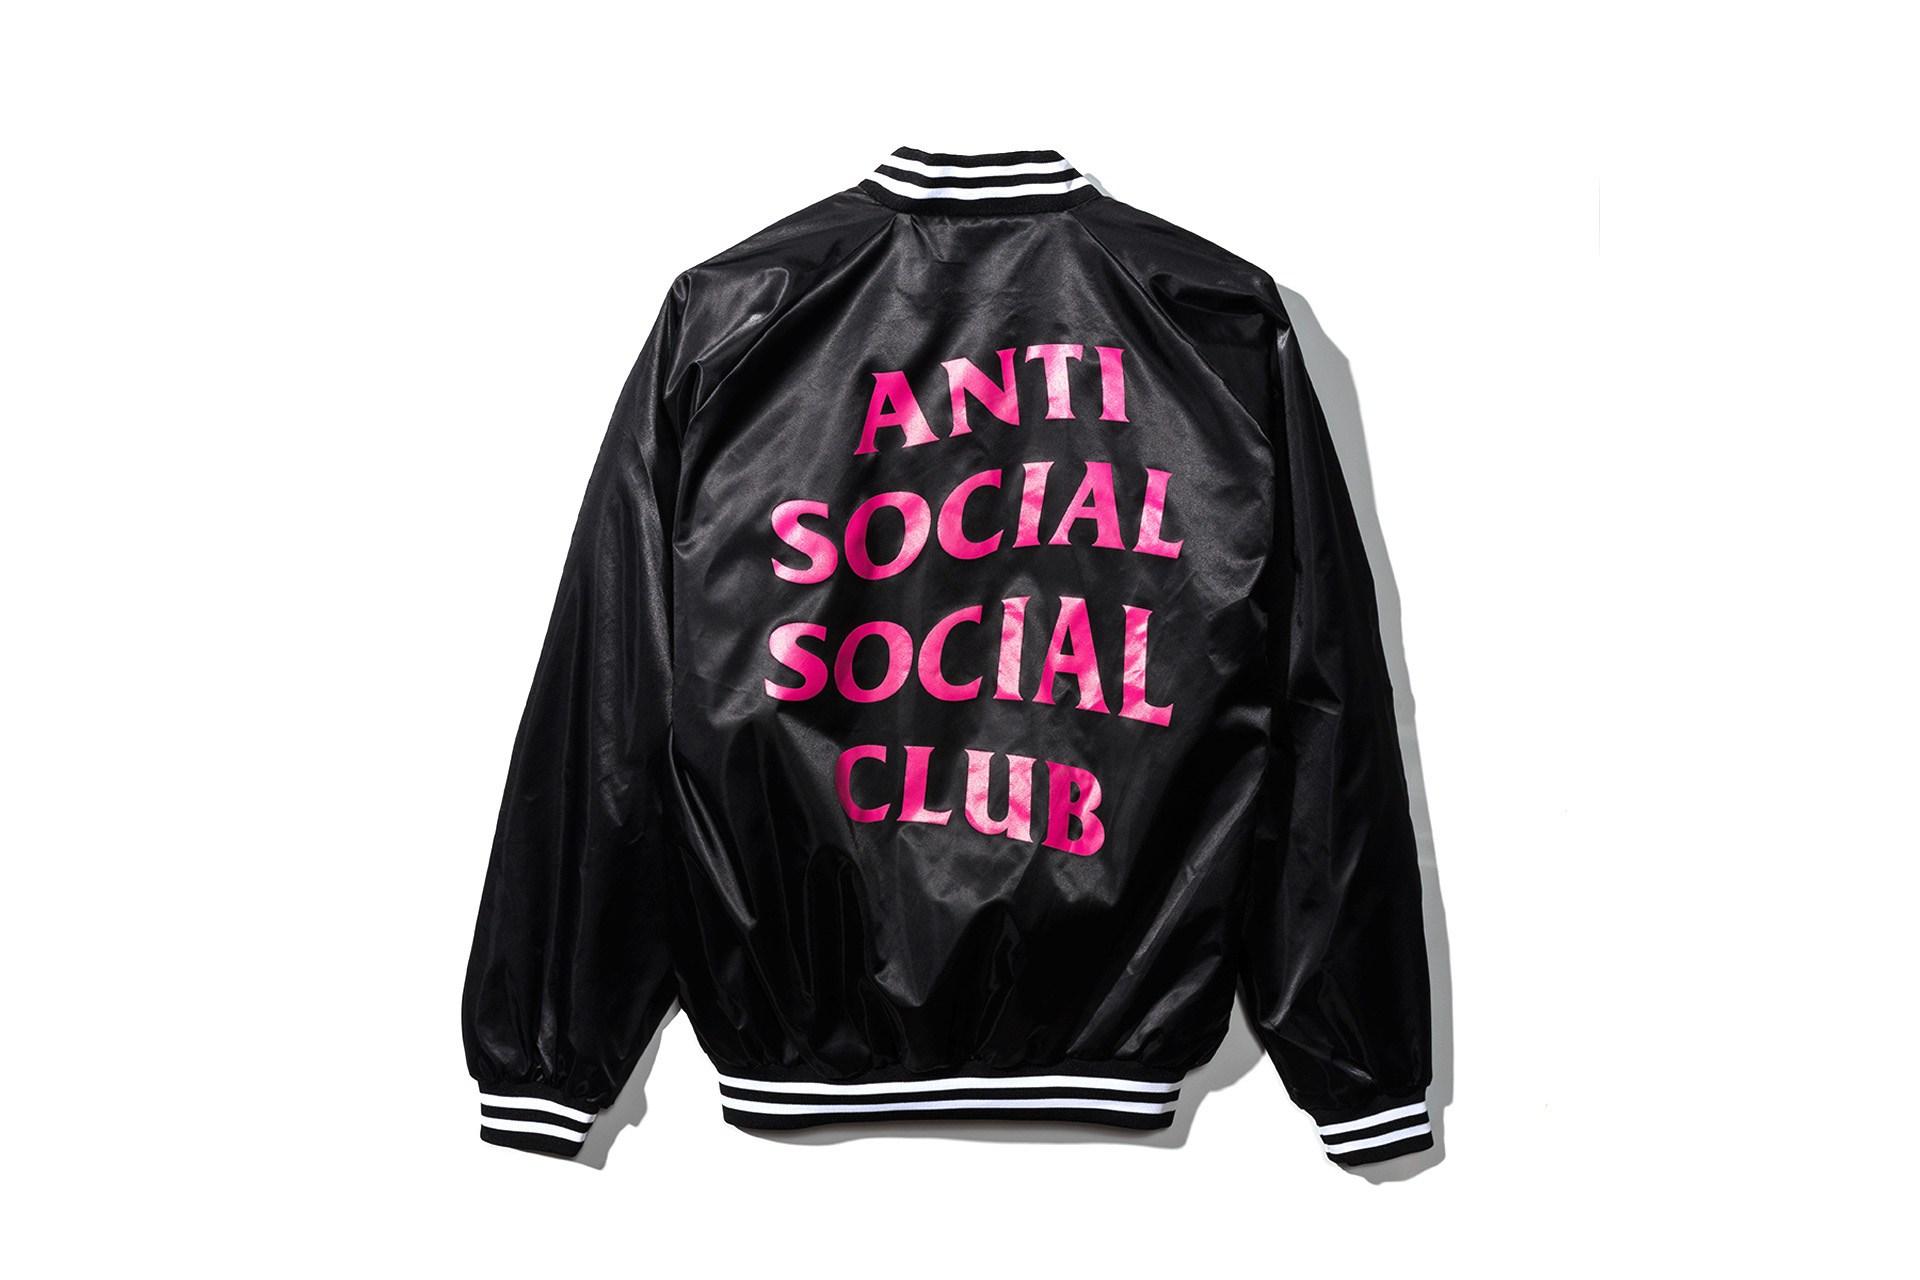 anti-social-social-club-collection-2017-spring-summer-43